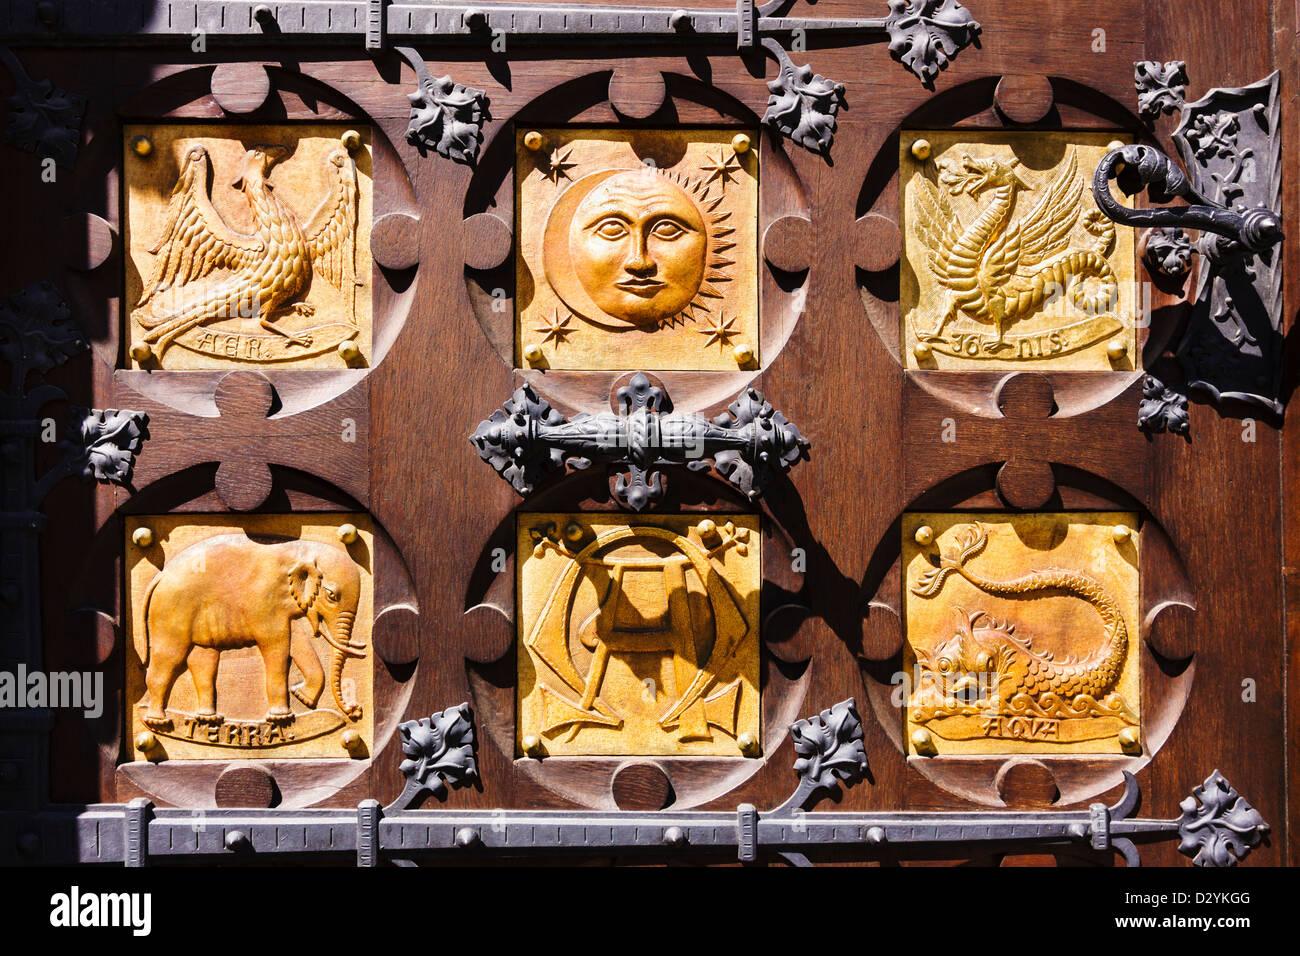 Klassische Elemente Schnitzereien an den Türen der Abtei des Heiligen Thomas, wo Gregor Mendel moderne Genetik Stockbild